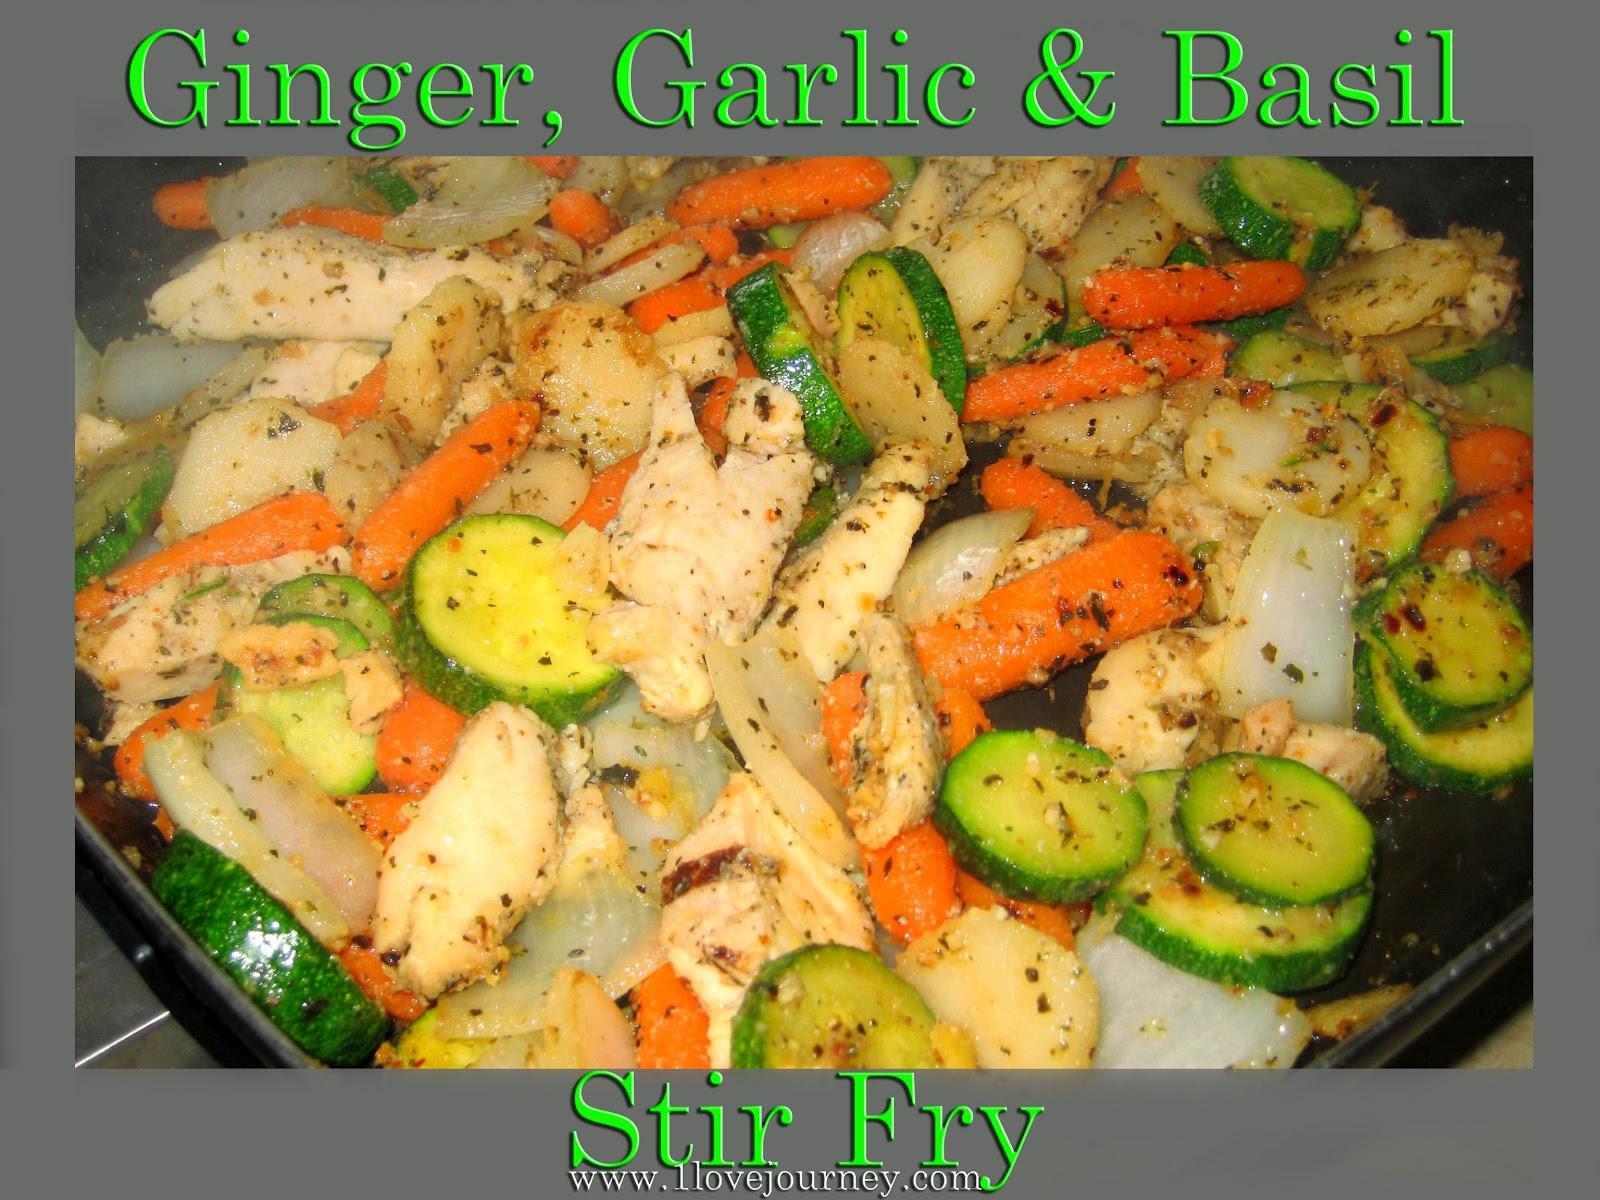 Ginger, Garlic & Basil Chicken Stir Fry | Onelovejourney